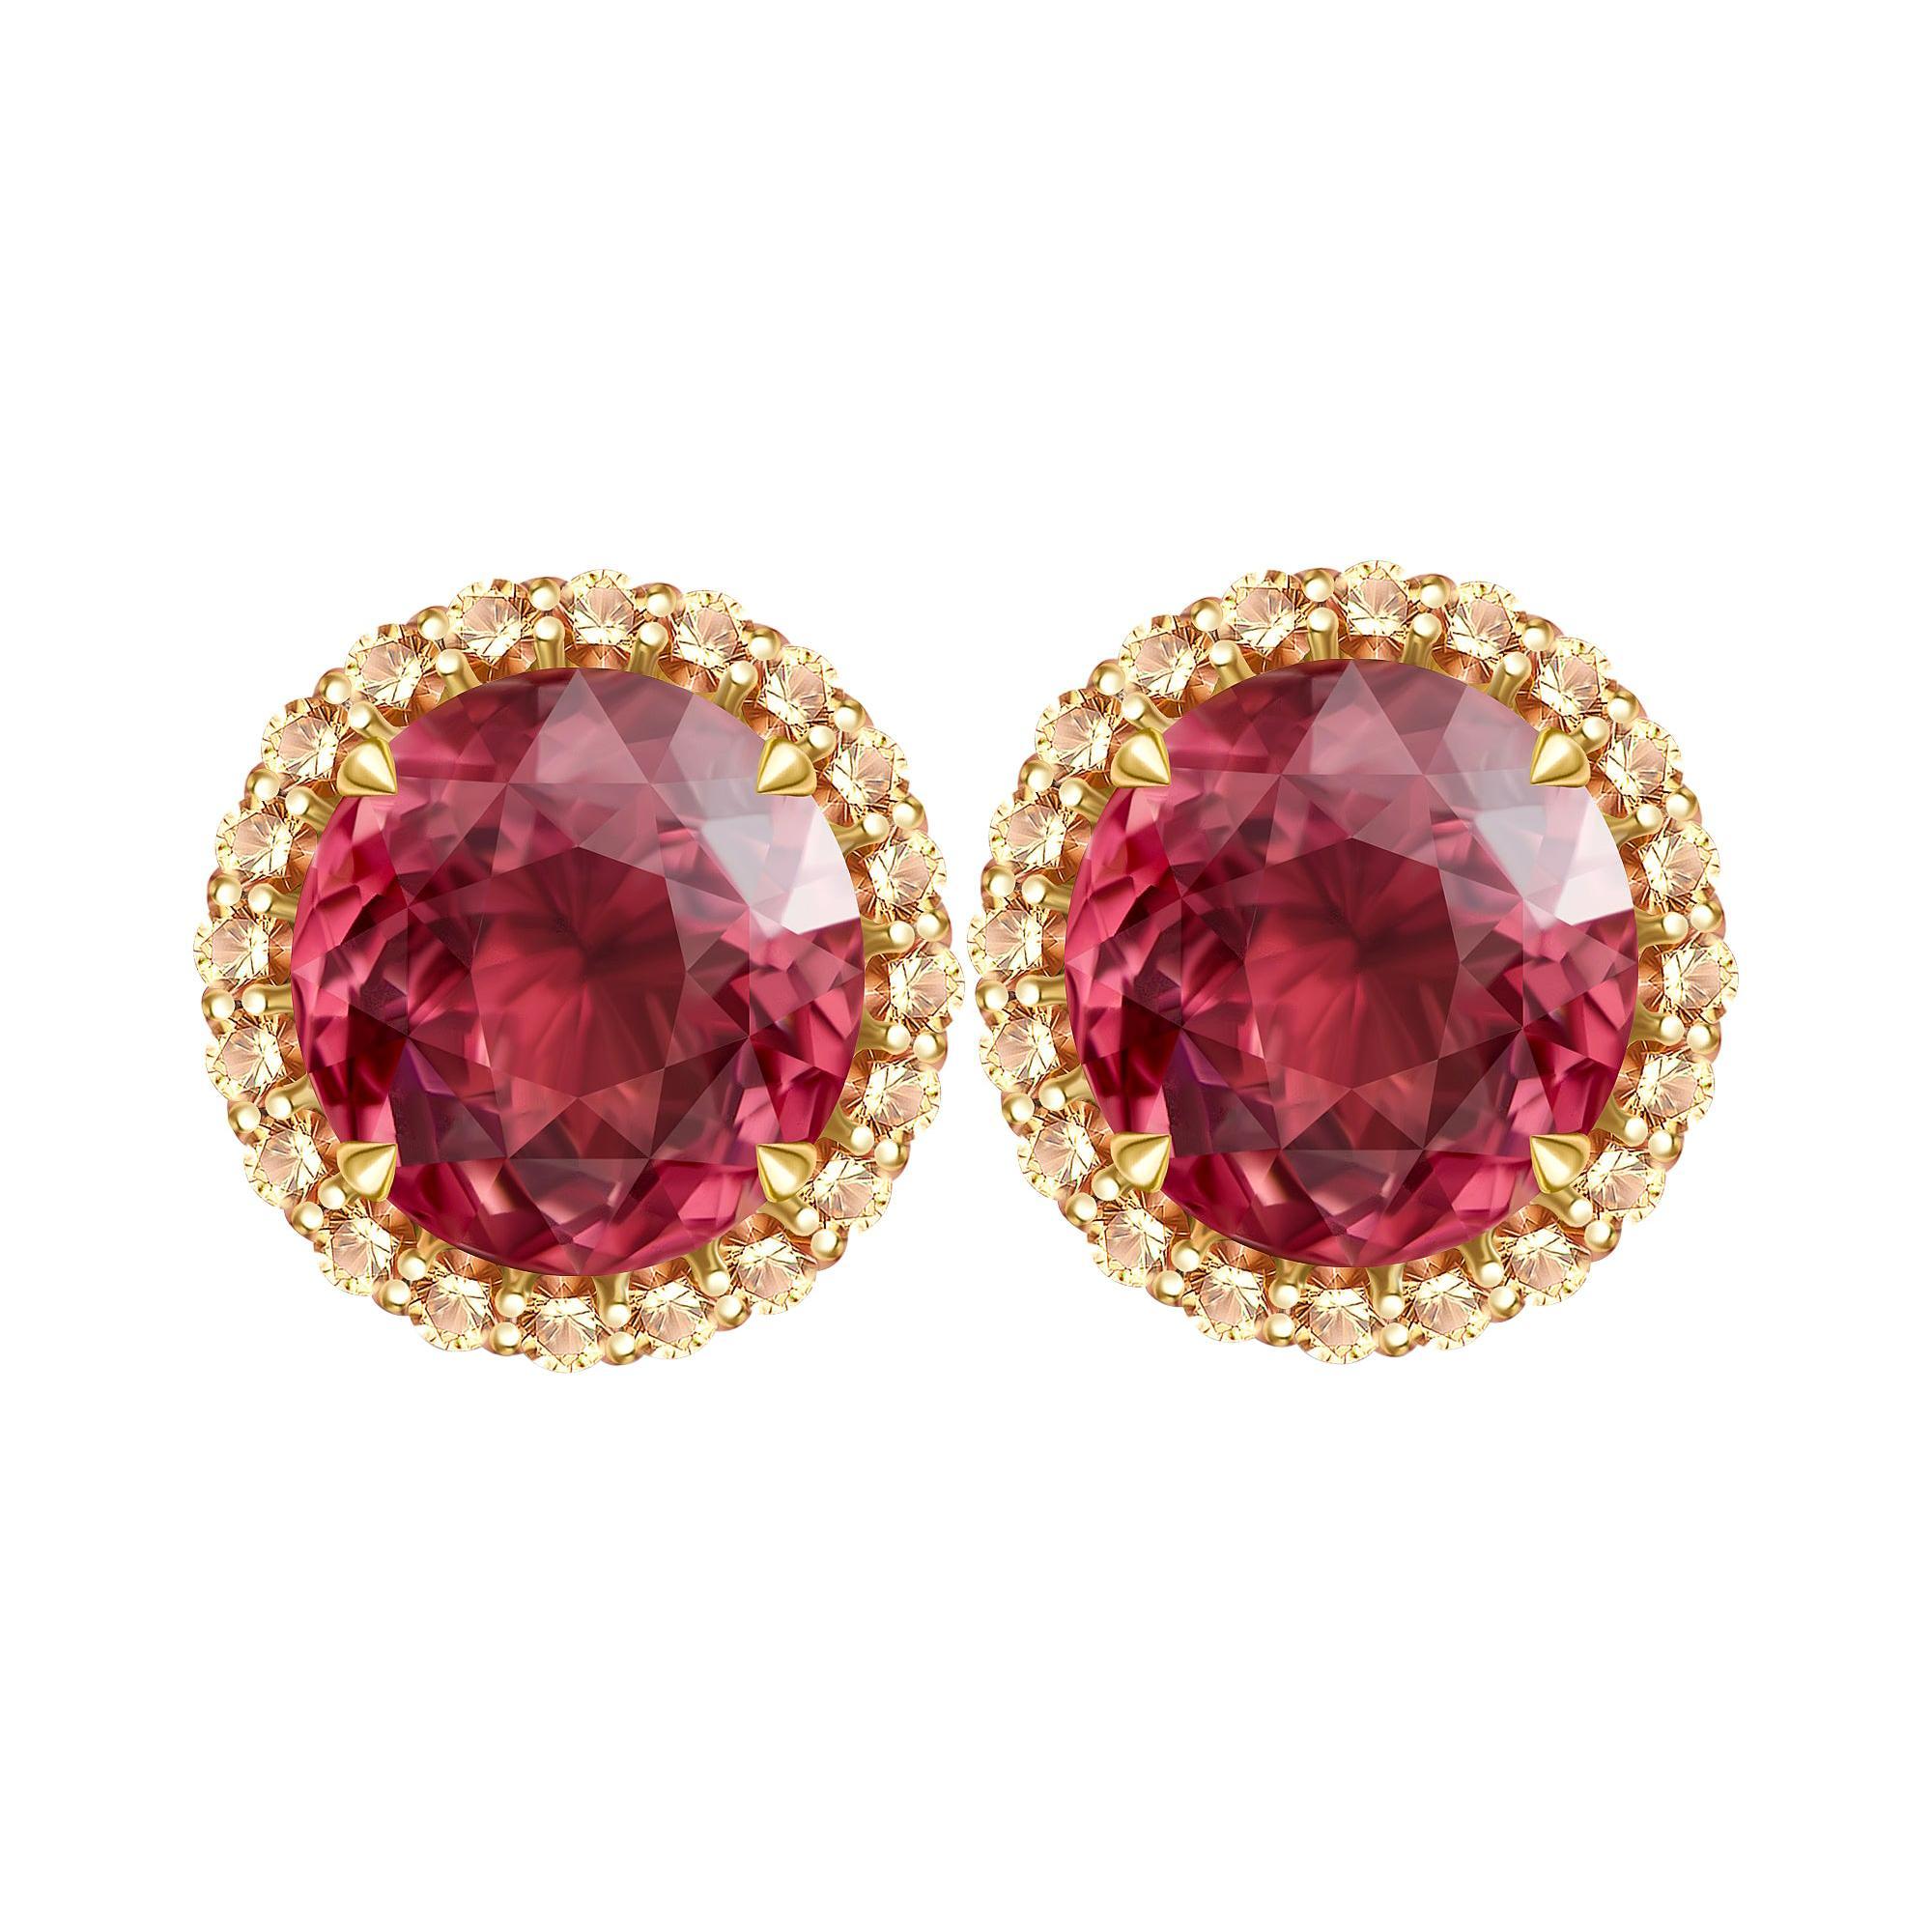 8 Carat Tourmaline Champagne Diamonds 18 Karat Yellow Gold Stud Earrings